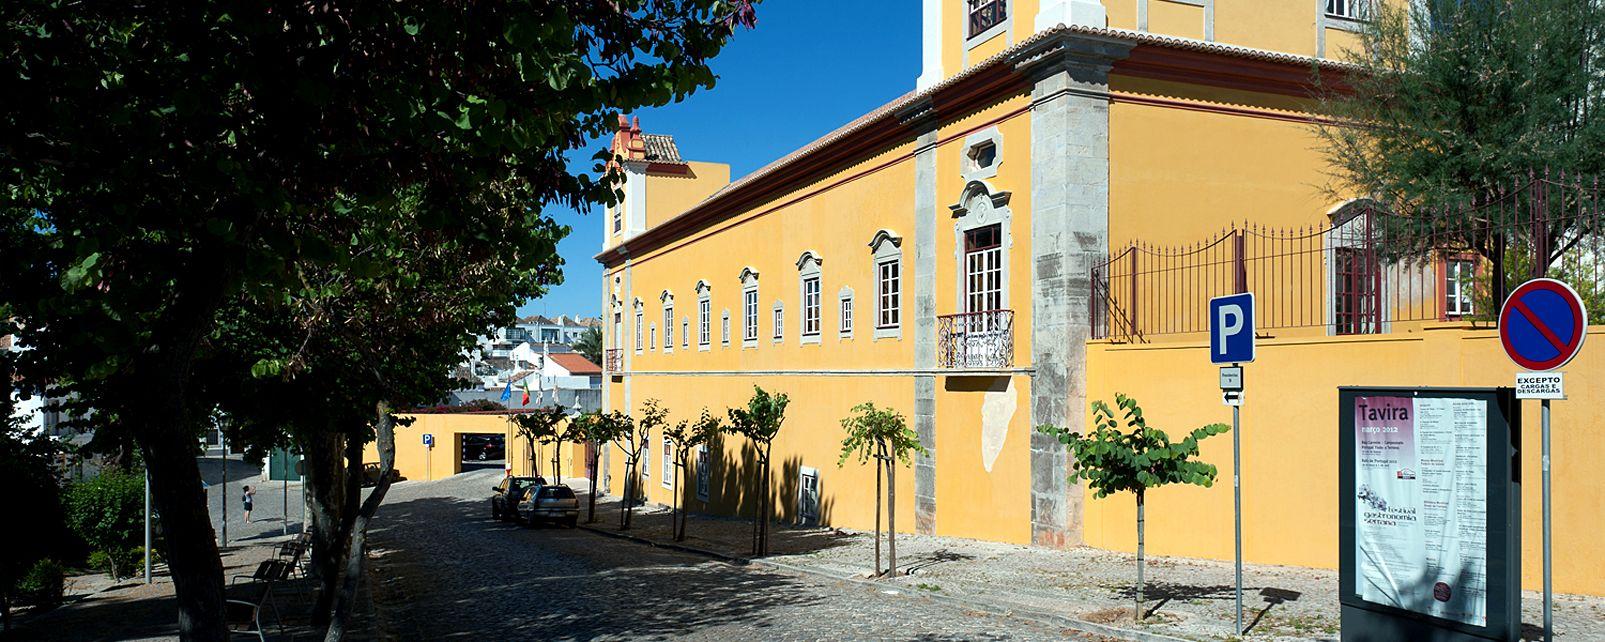 Hotel Pousada de Tavira - Convento da Graca